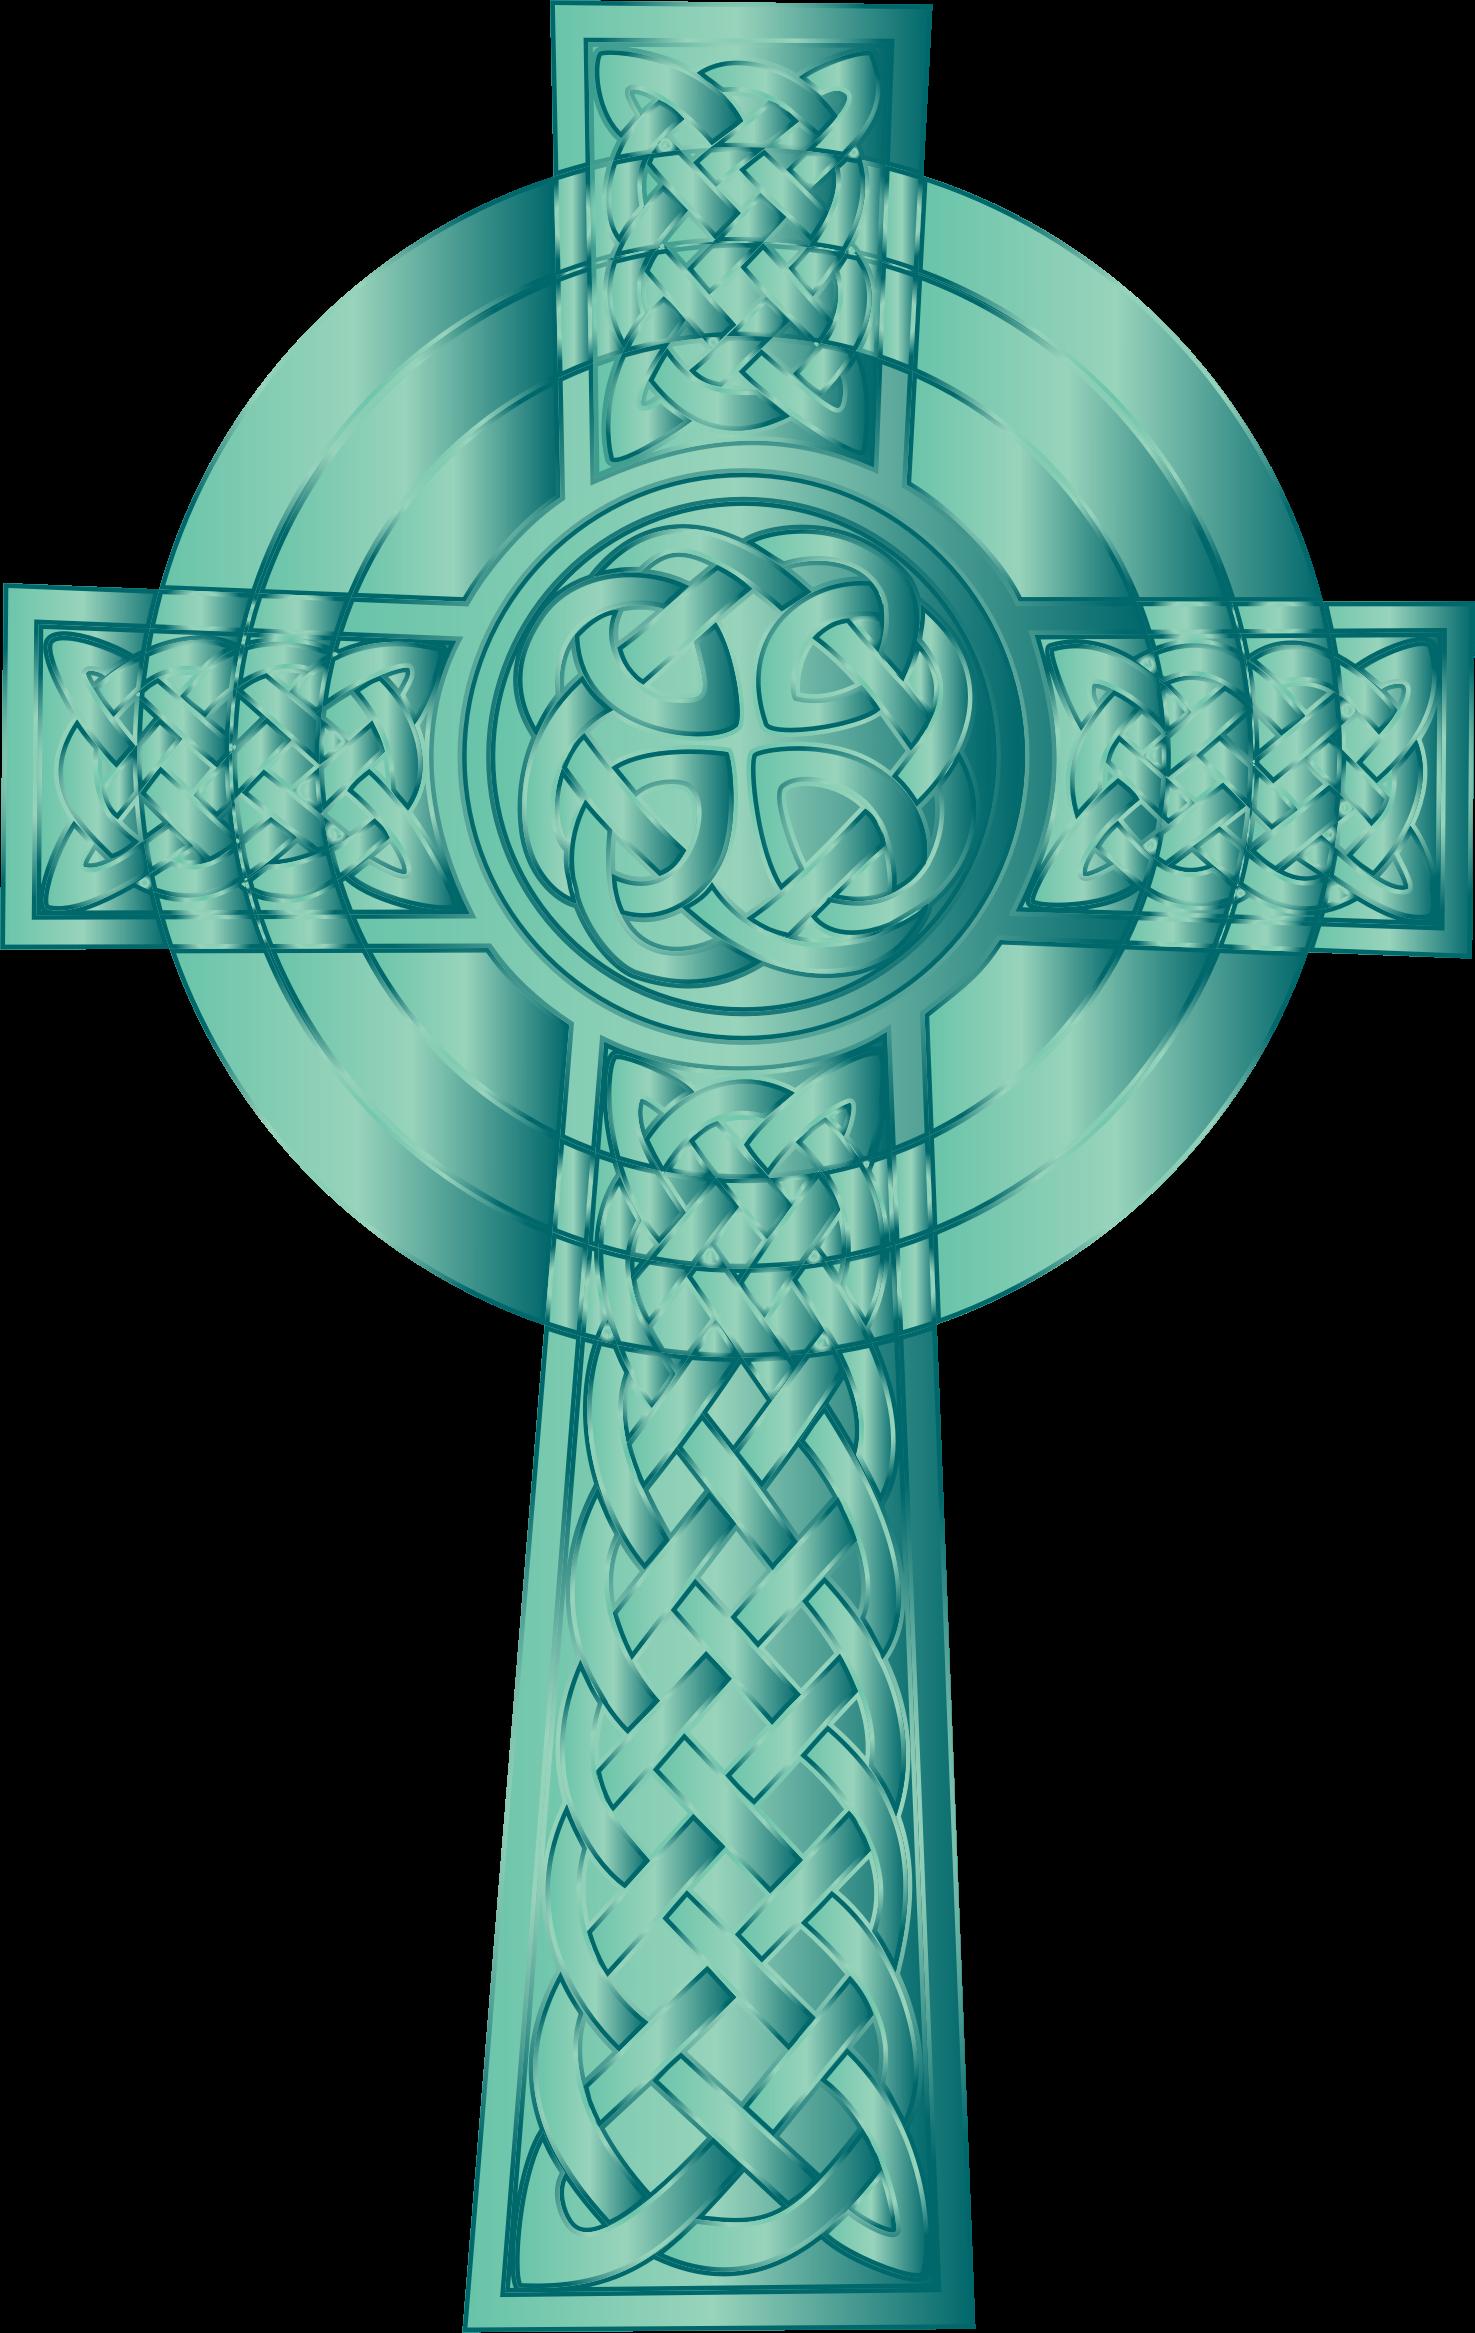 Teal cross clipart free stock Clipart - Jade Celtic Cross free stock